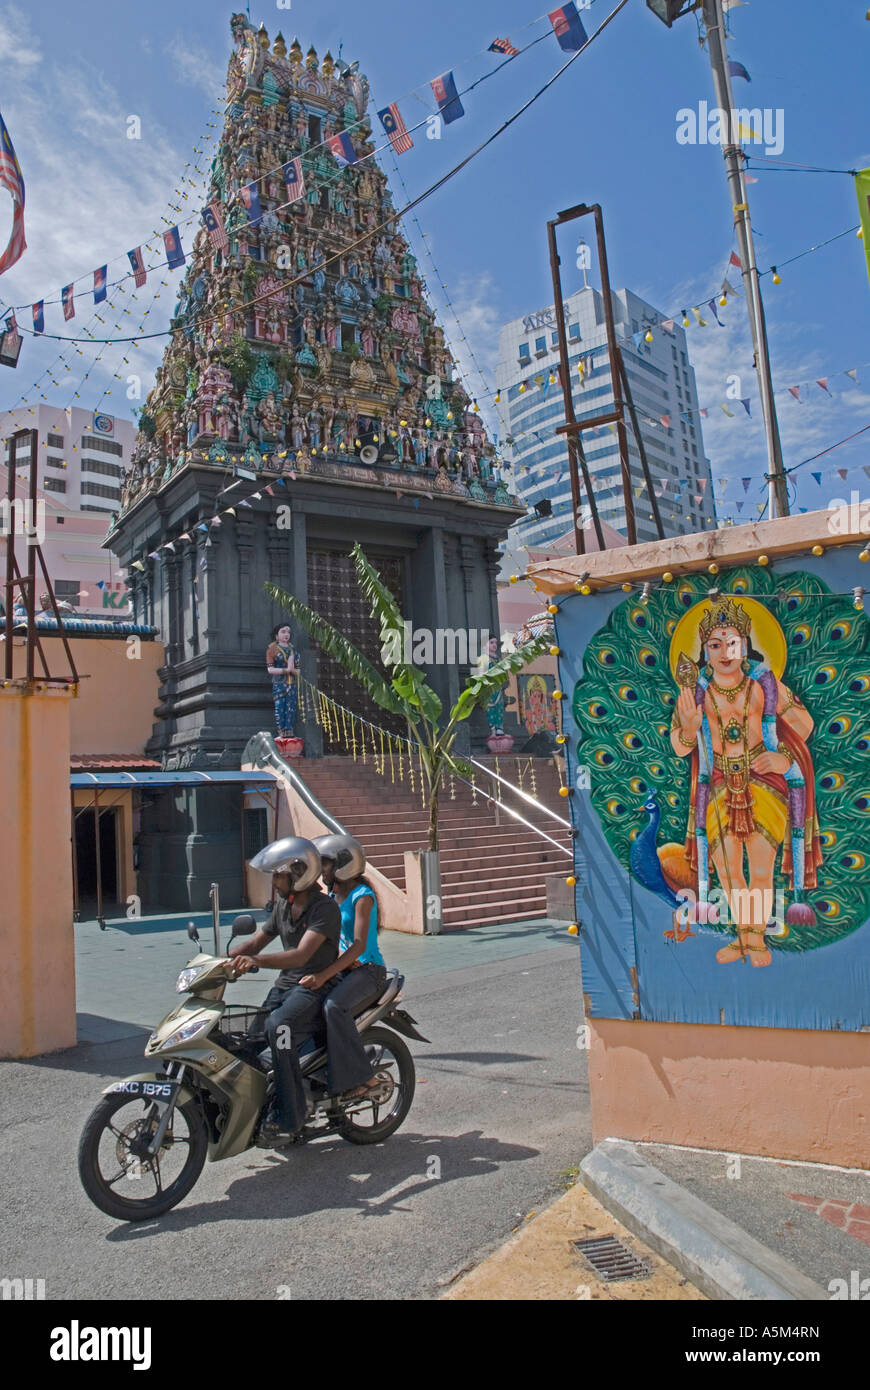 The Sri Mariamman Indian temple in Johor Bahru Malaysia - Stock Image